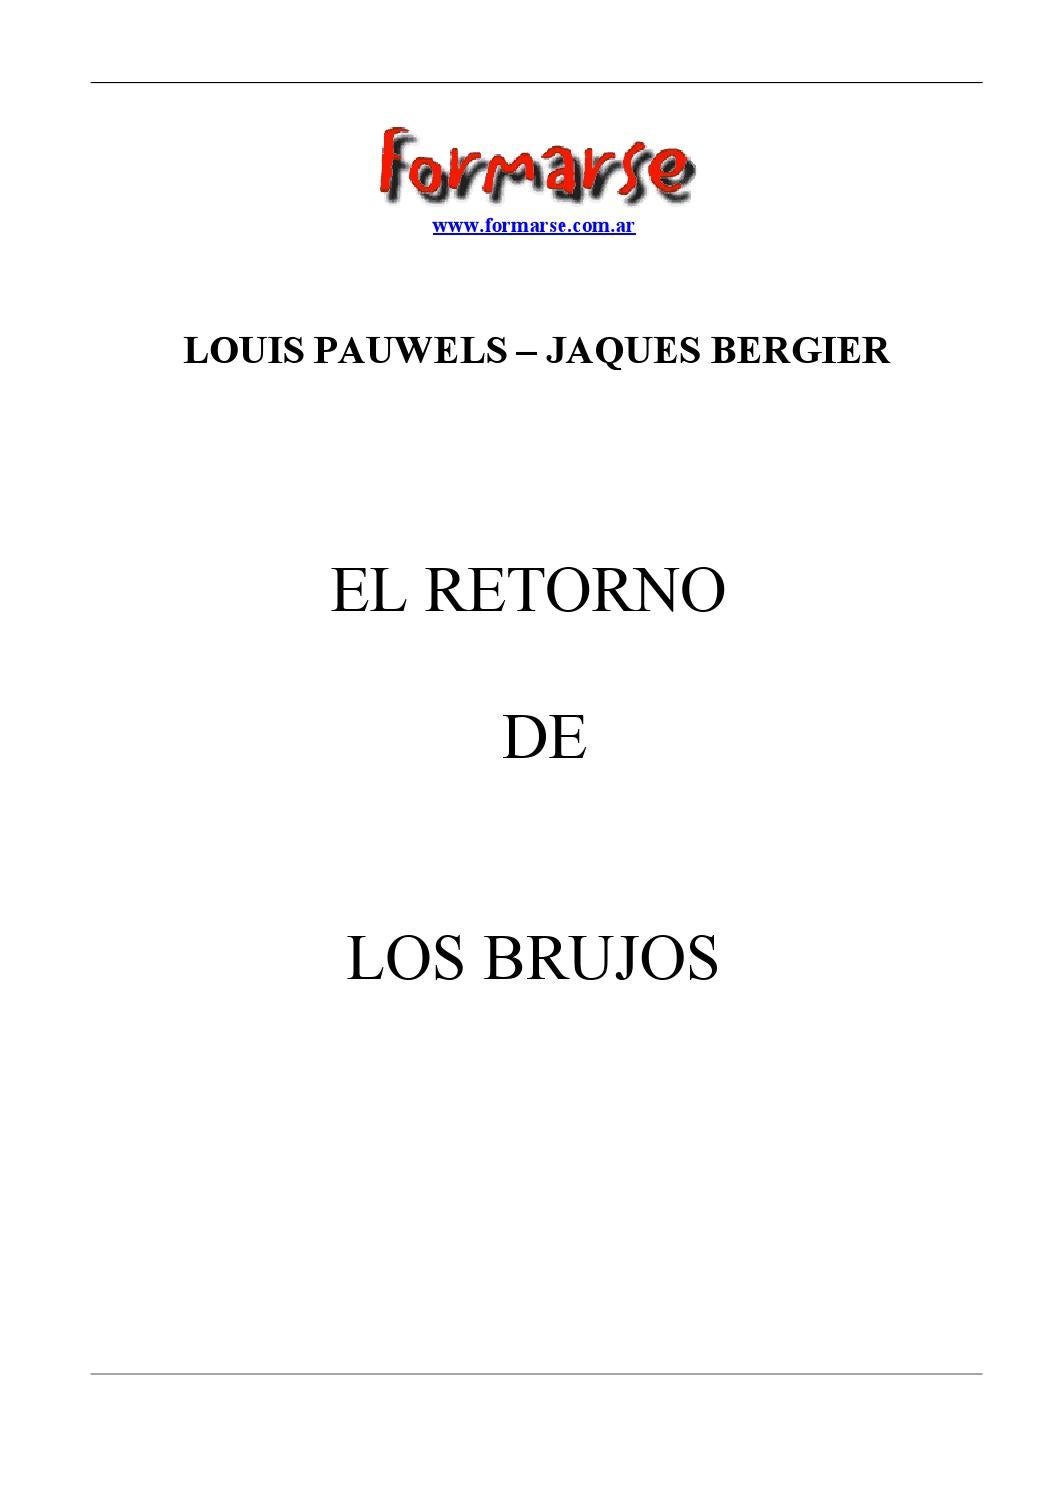 Pauwels bergier el retorno de los brujos by Gran Logia de Guerrero - issuu 5b80ab42c4520